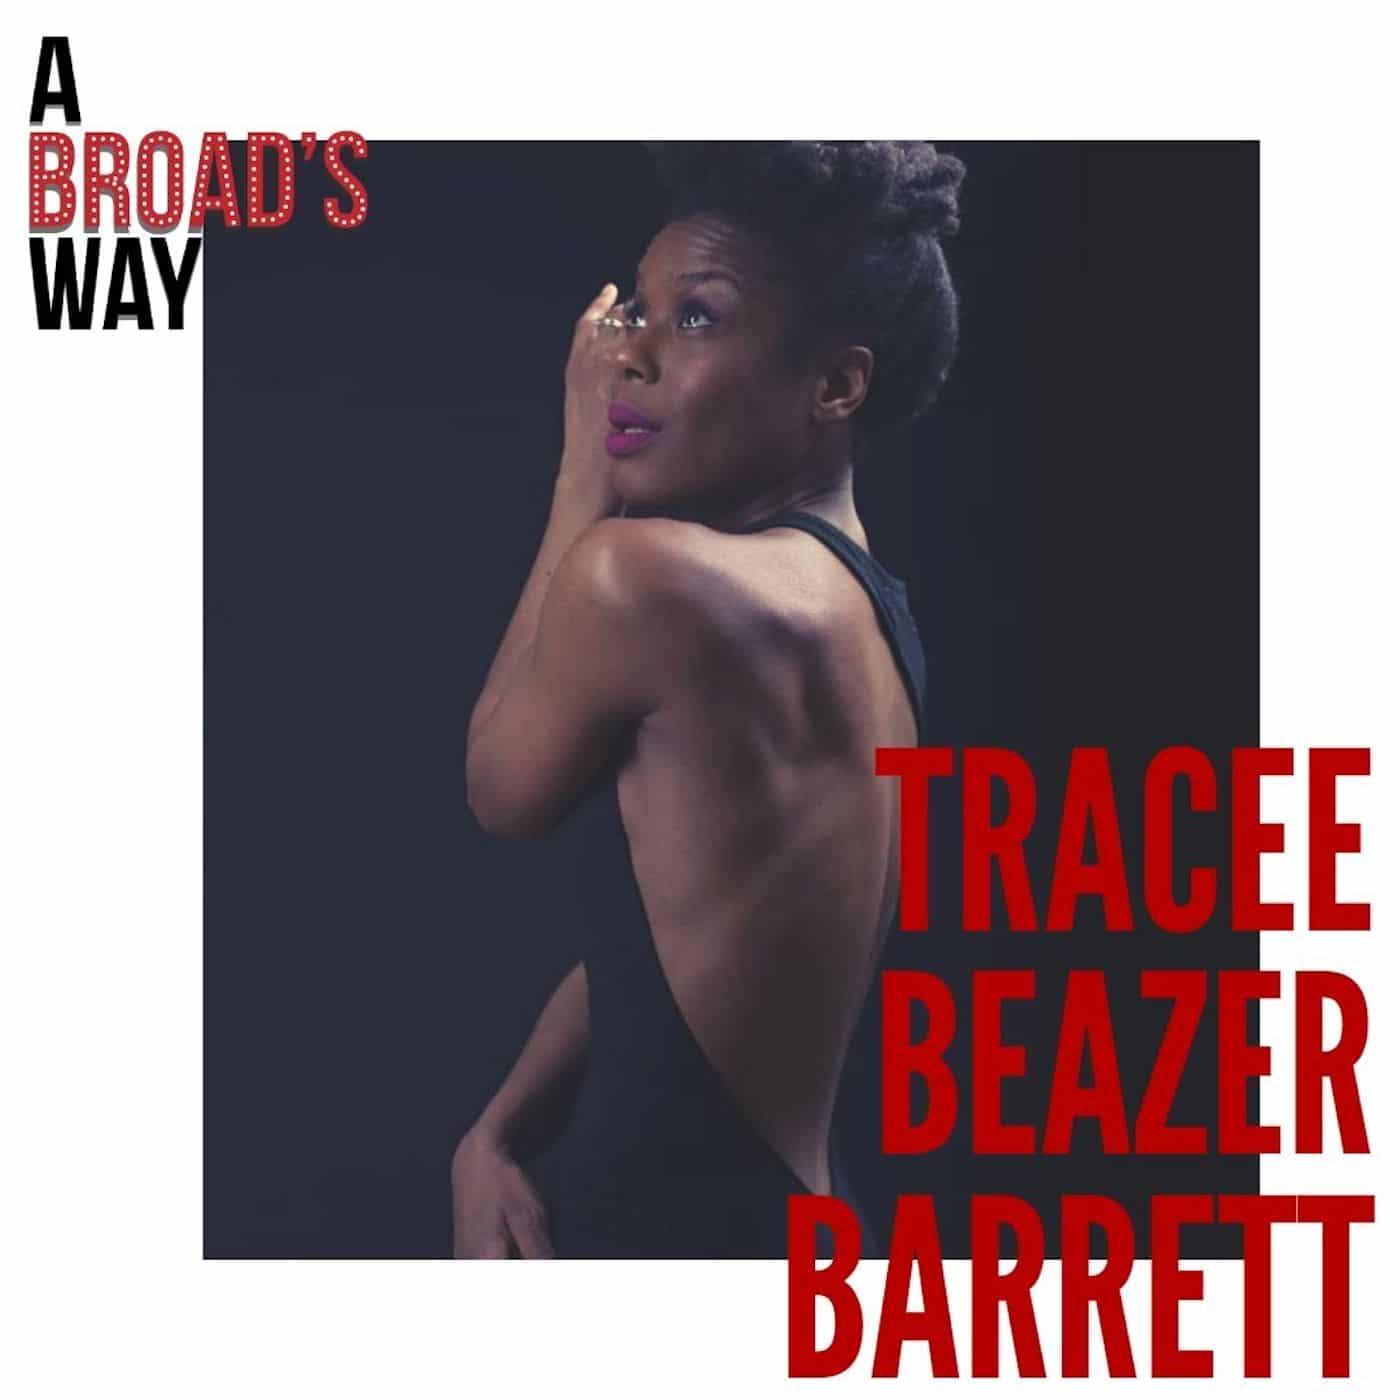 A Broad's Way -Episode 6 Tracee Beazer Barrett